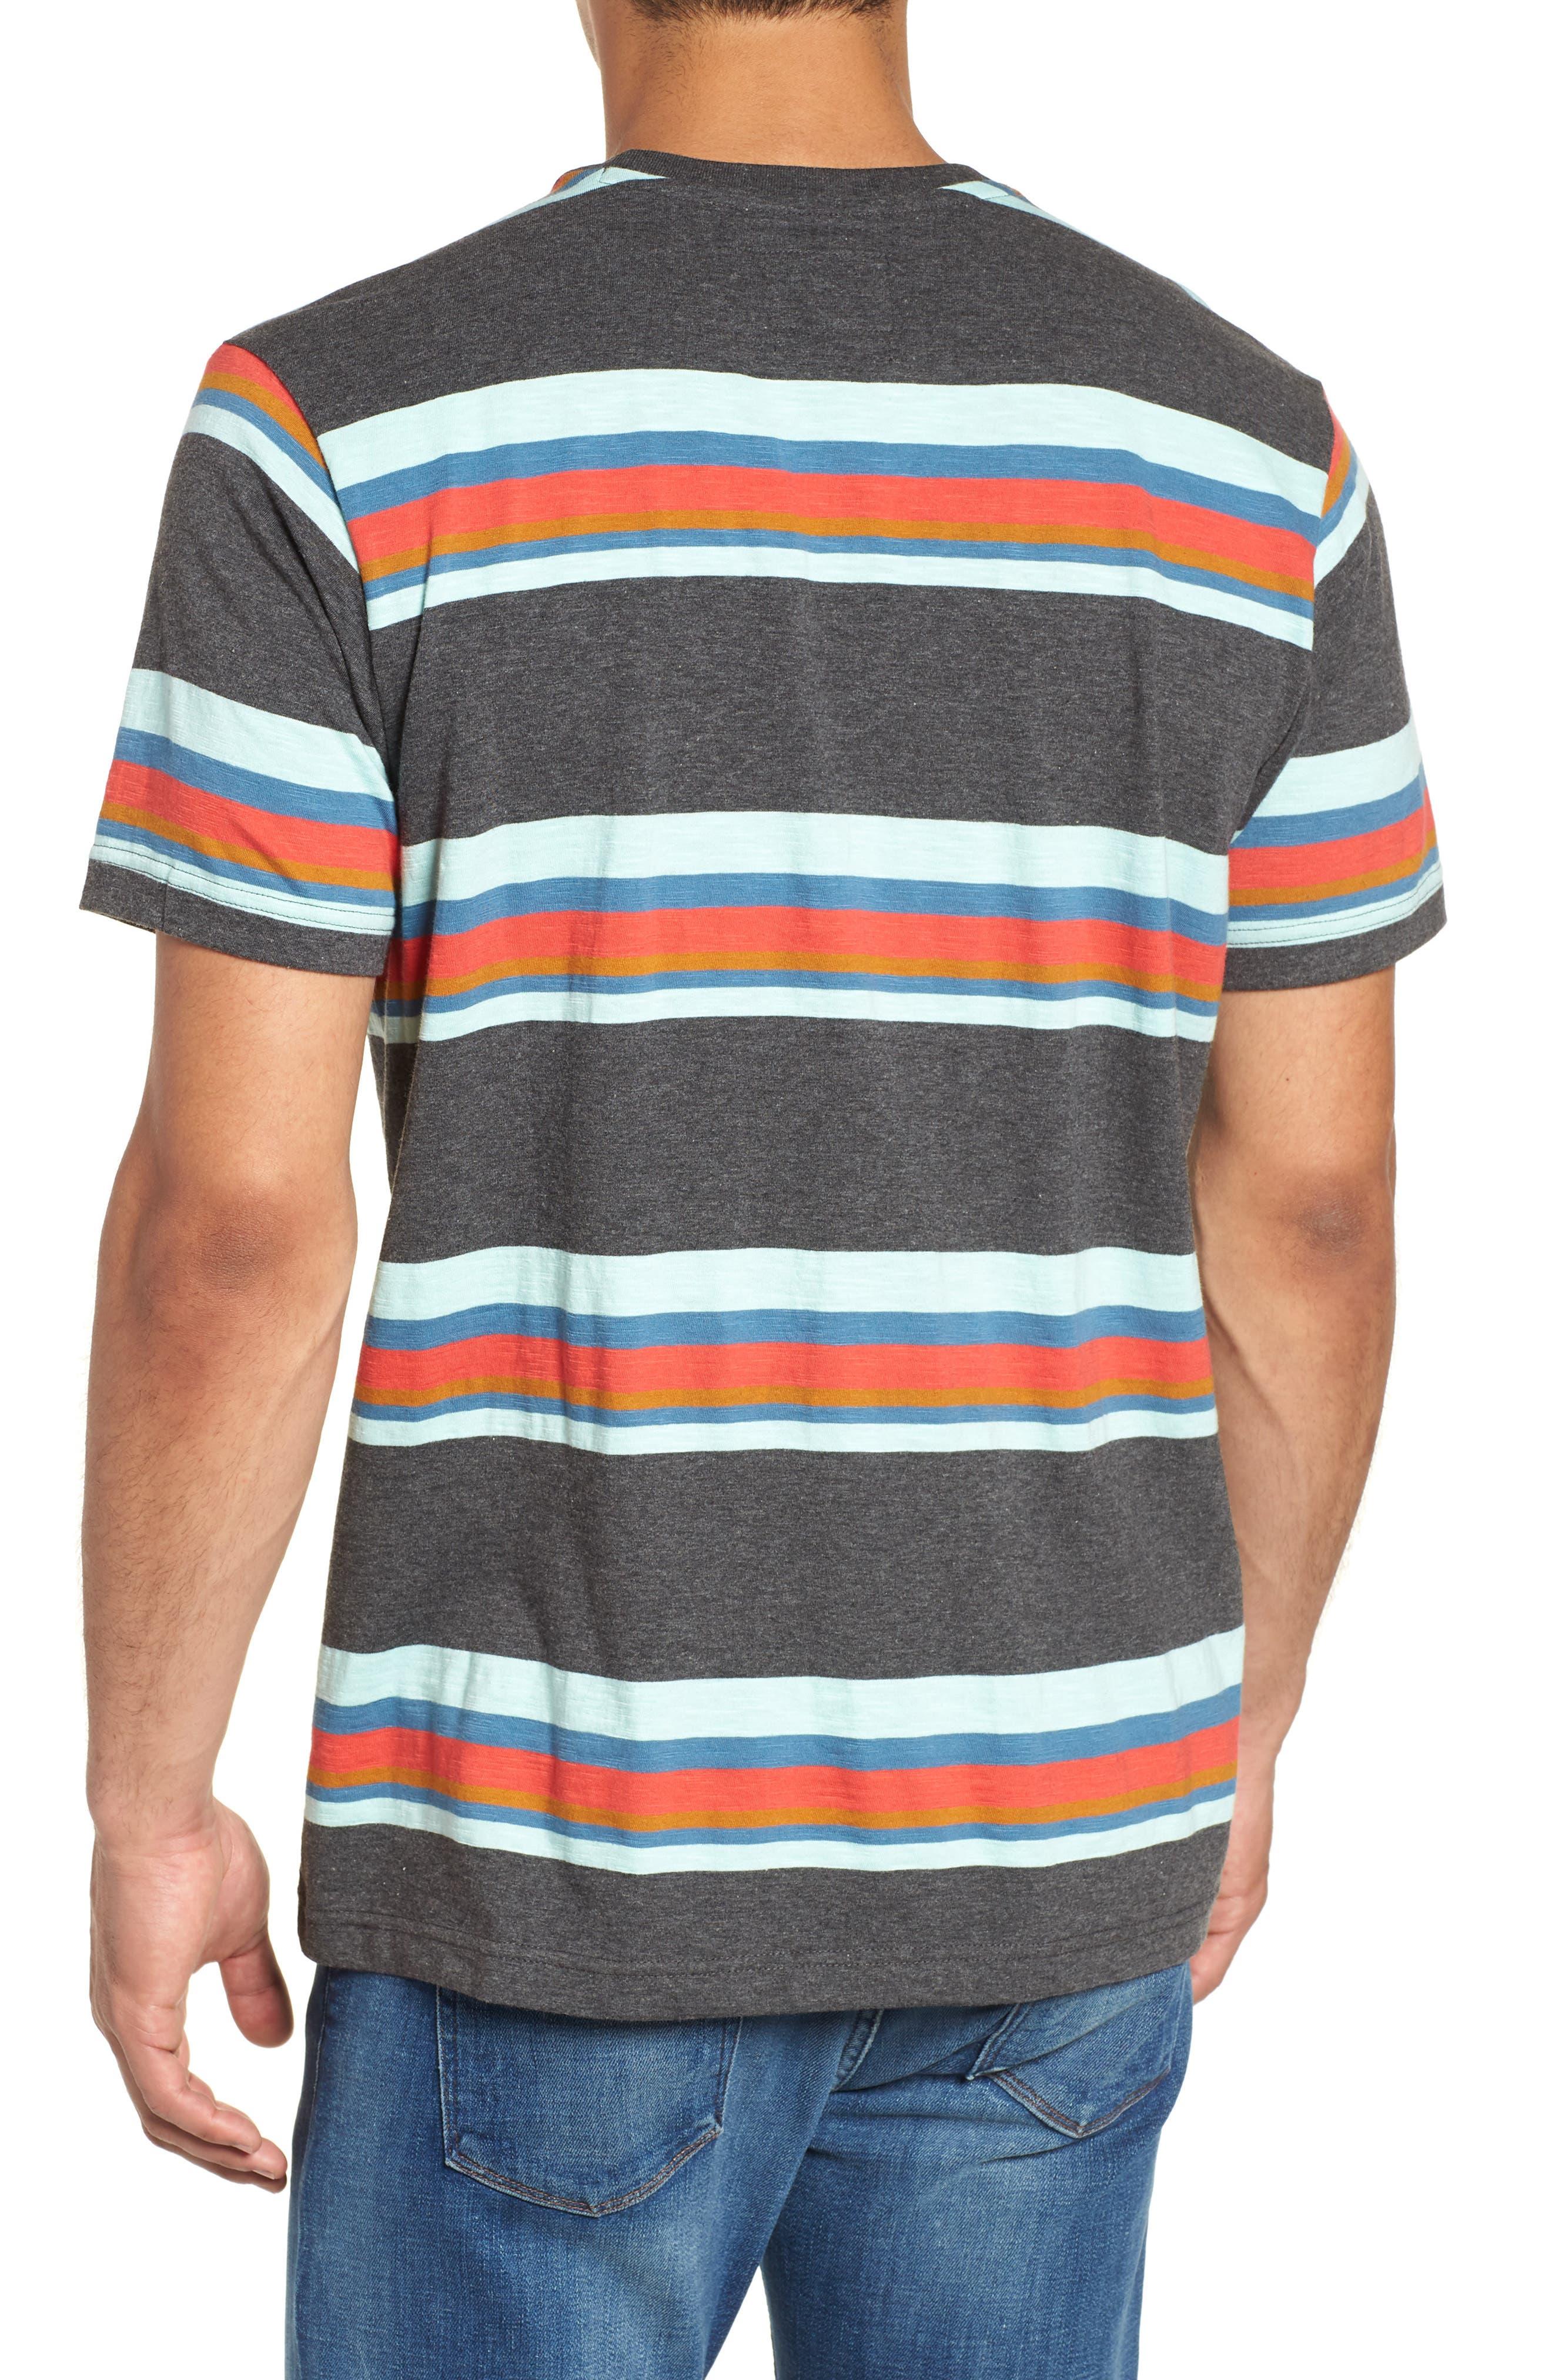 Prospect T-Shirt,                             Alternate thumbnail 2, color,                             020